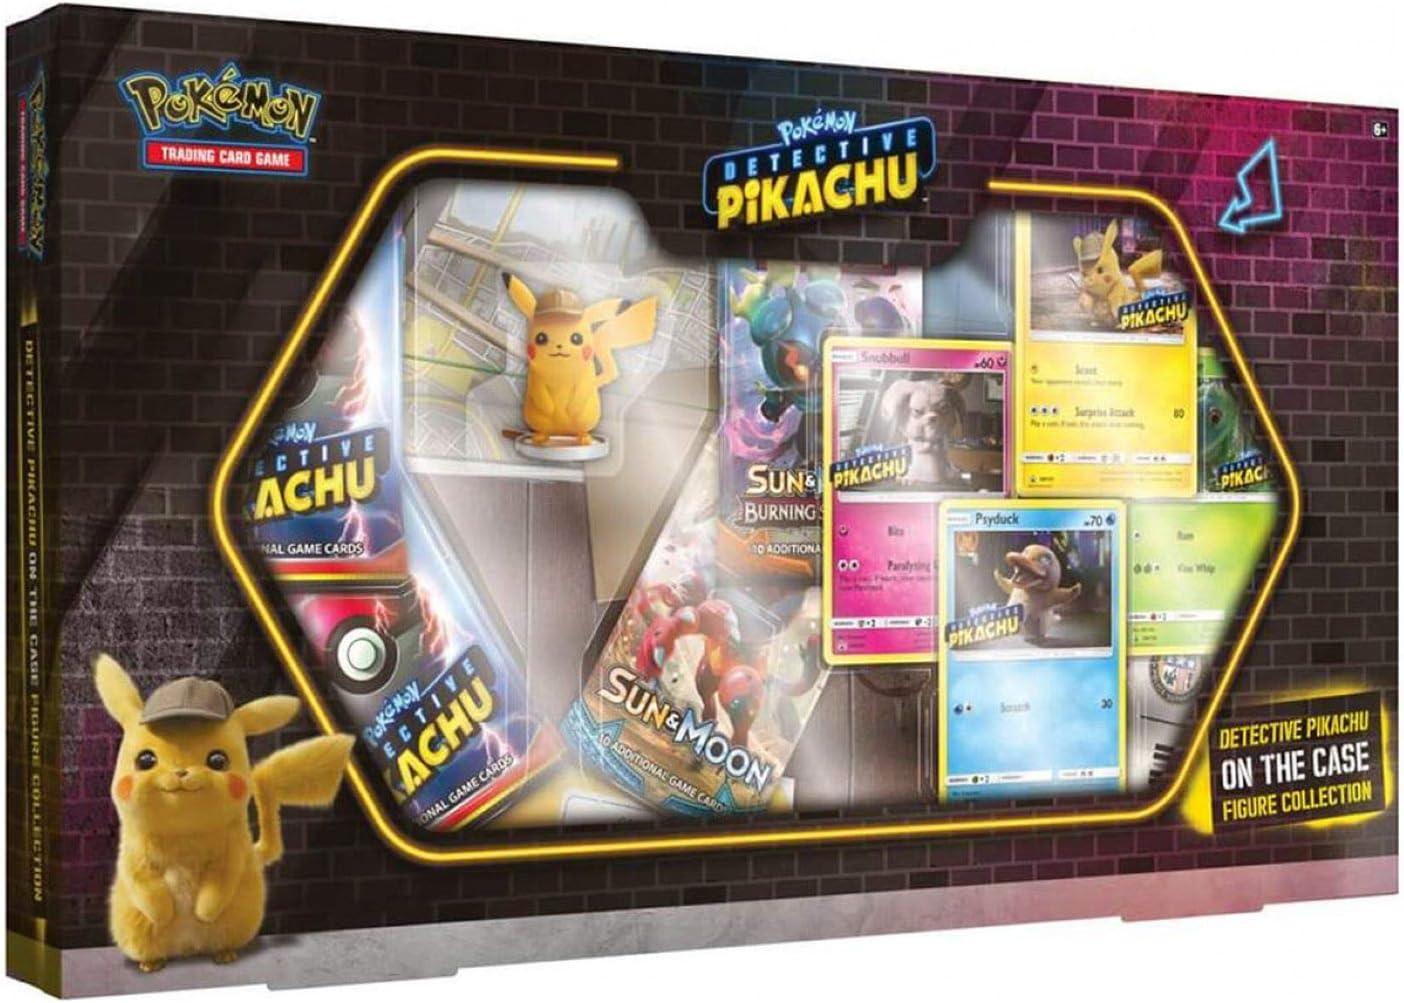 Pokémon TCG: Detective Pikachu ON The CASE Box | 4 Foil Promo Cards | 5 Booster Packs | Detective Pikachu Figure